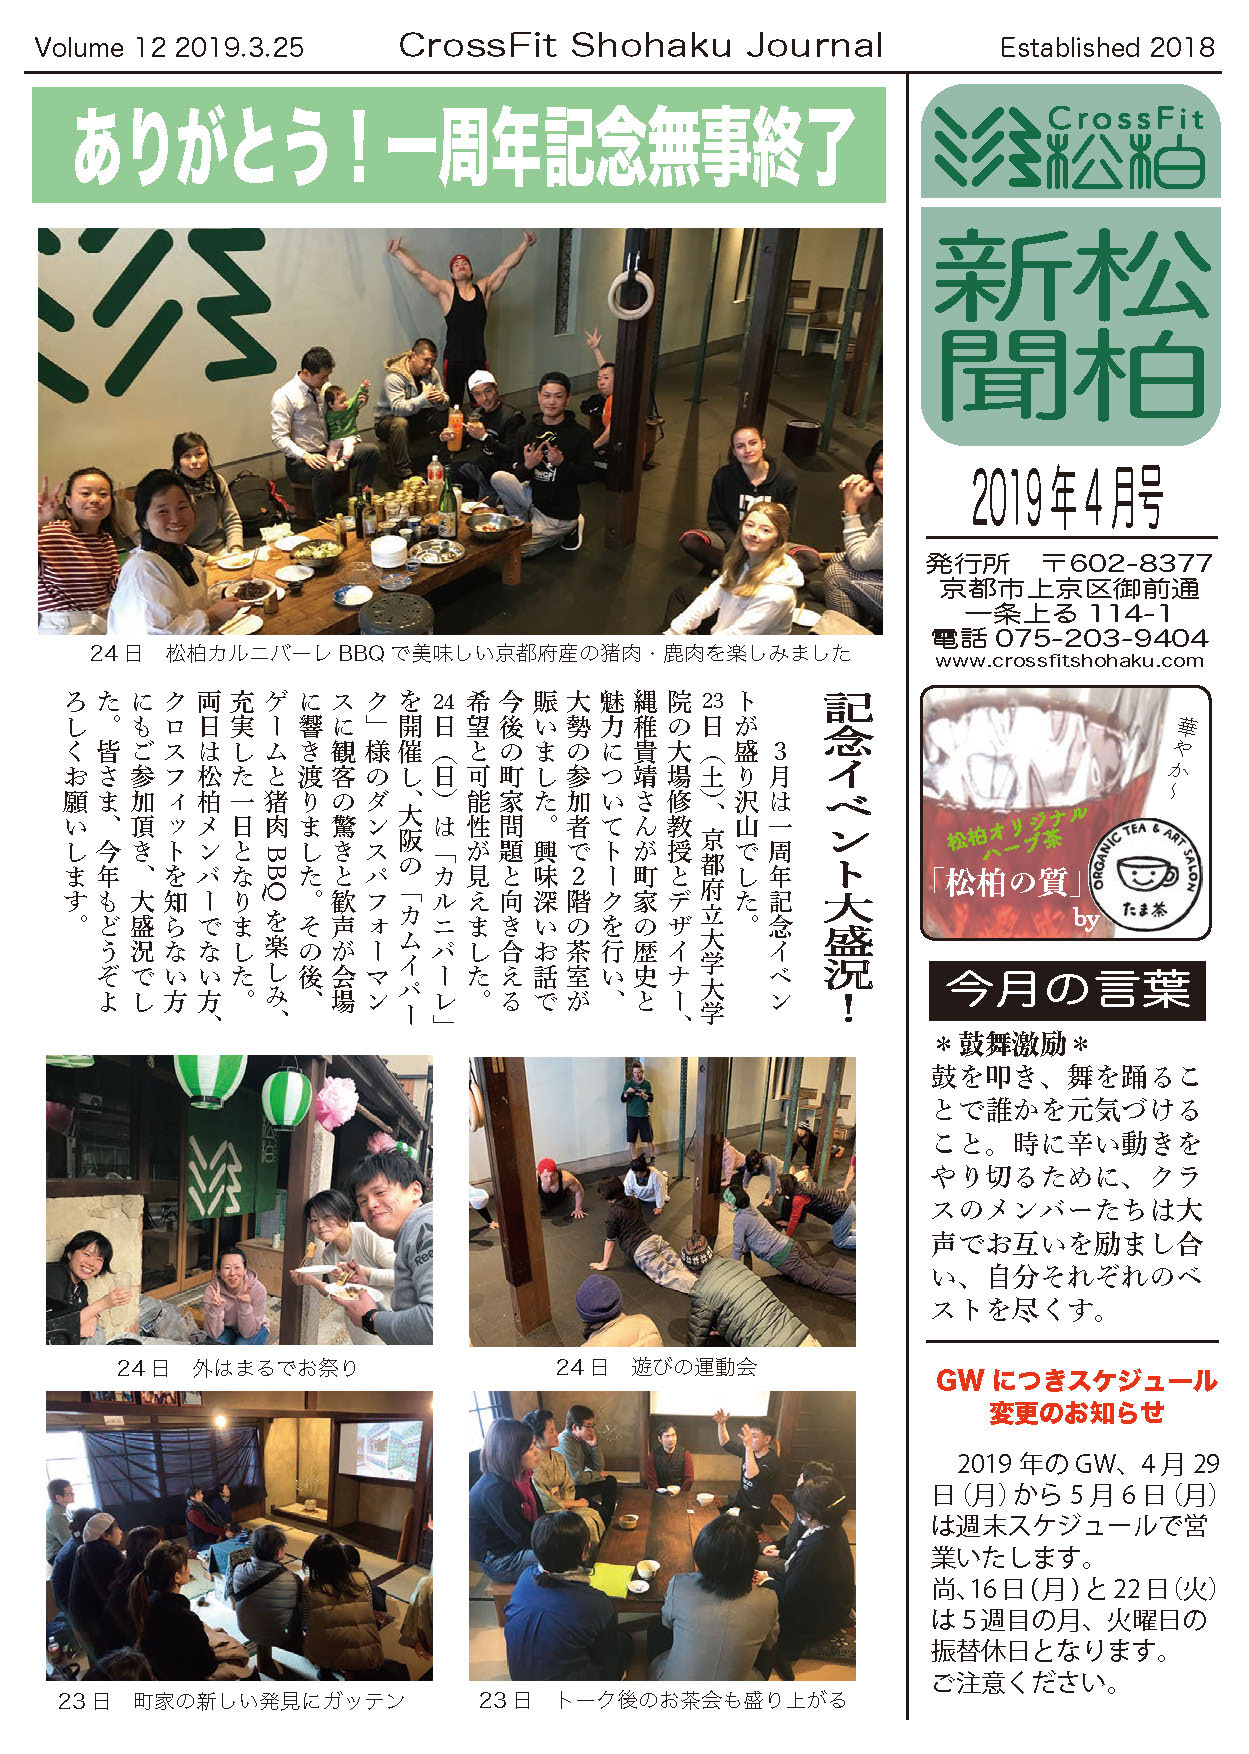 AllNewsletters_ページ_24.jpg